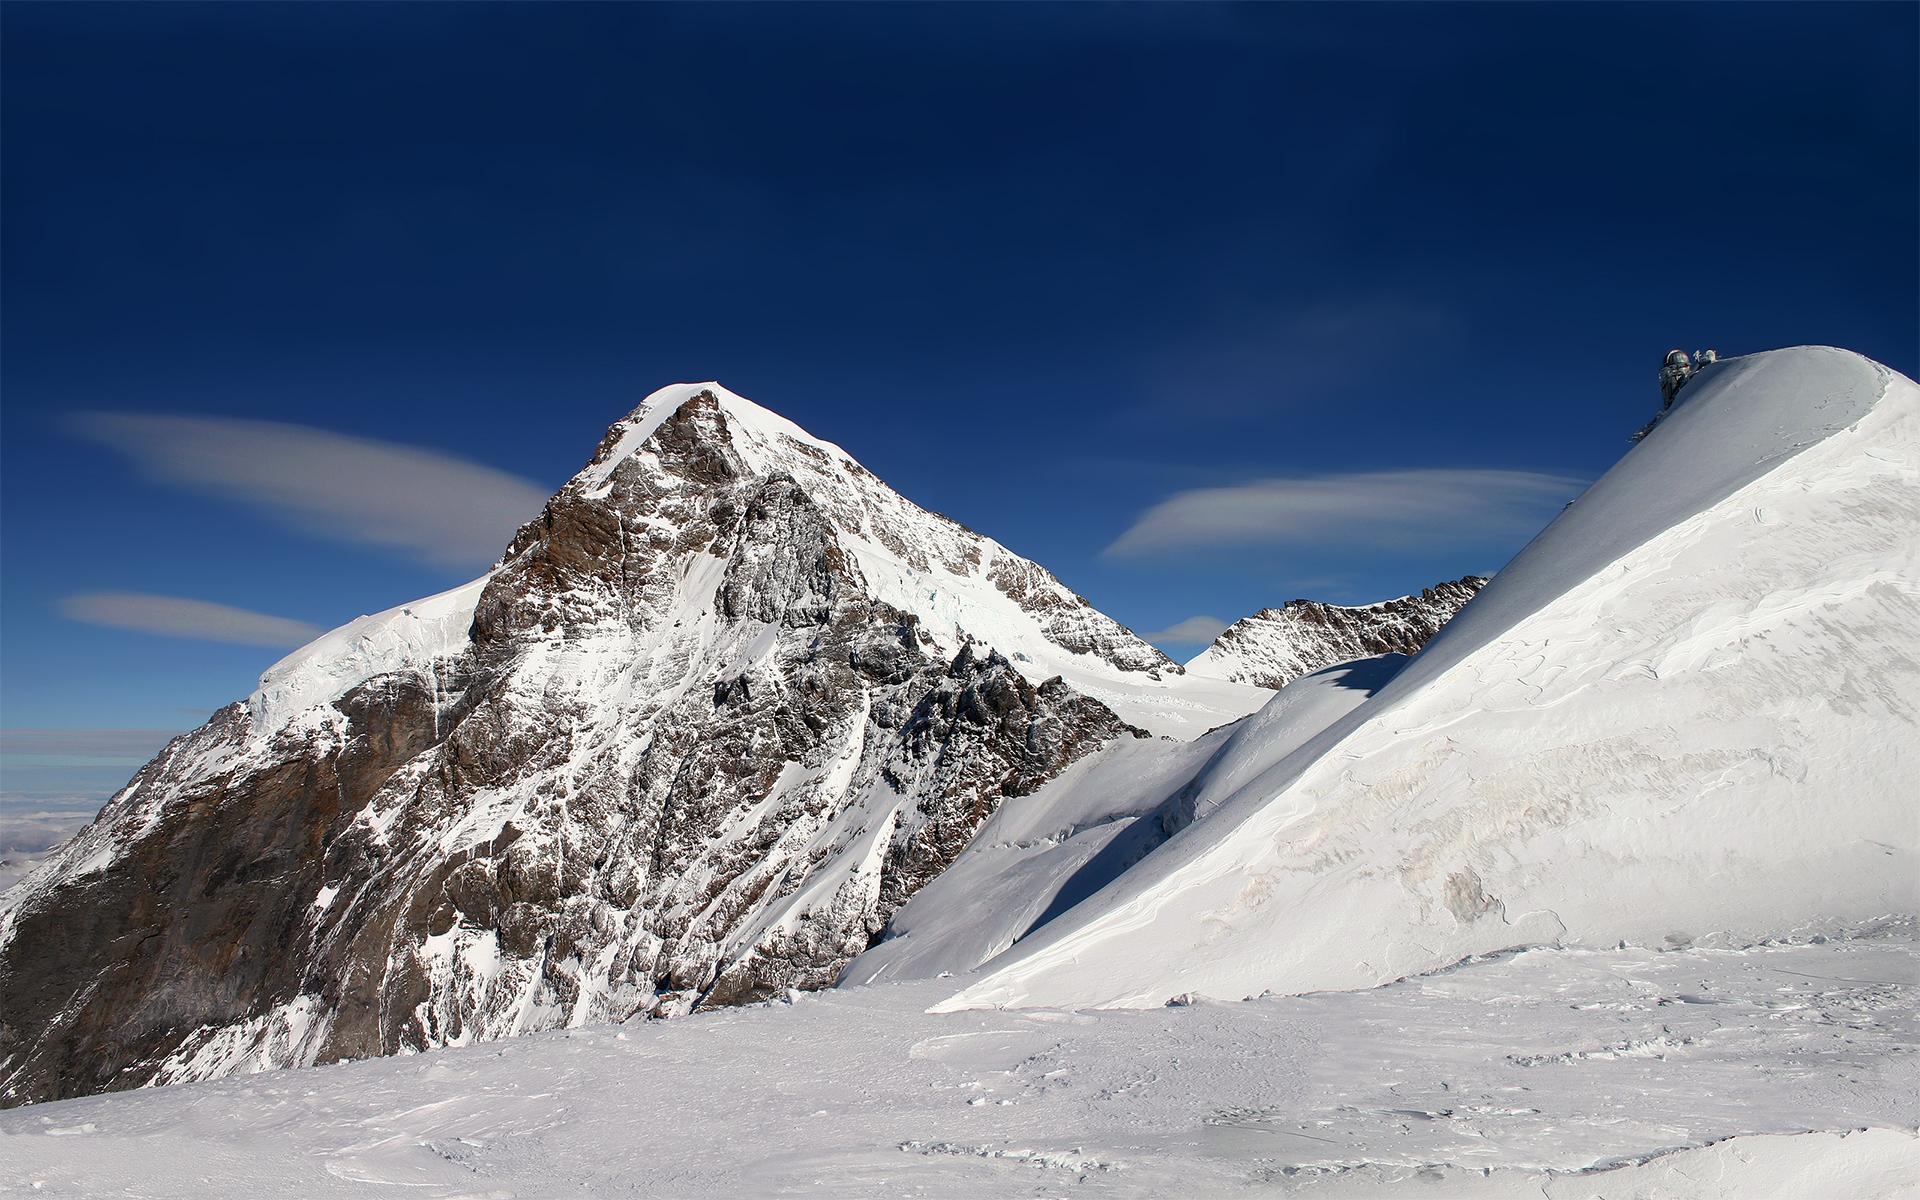 Winter Mountain wallpaper - 988411